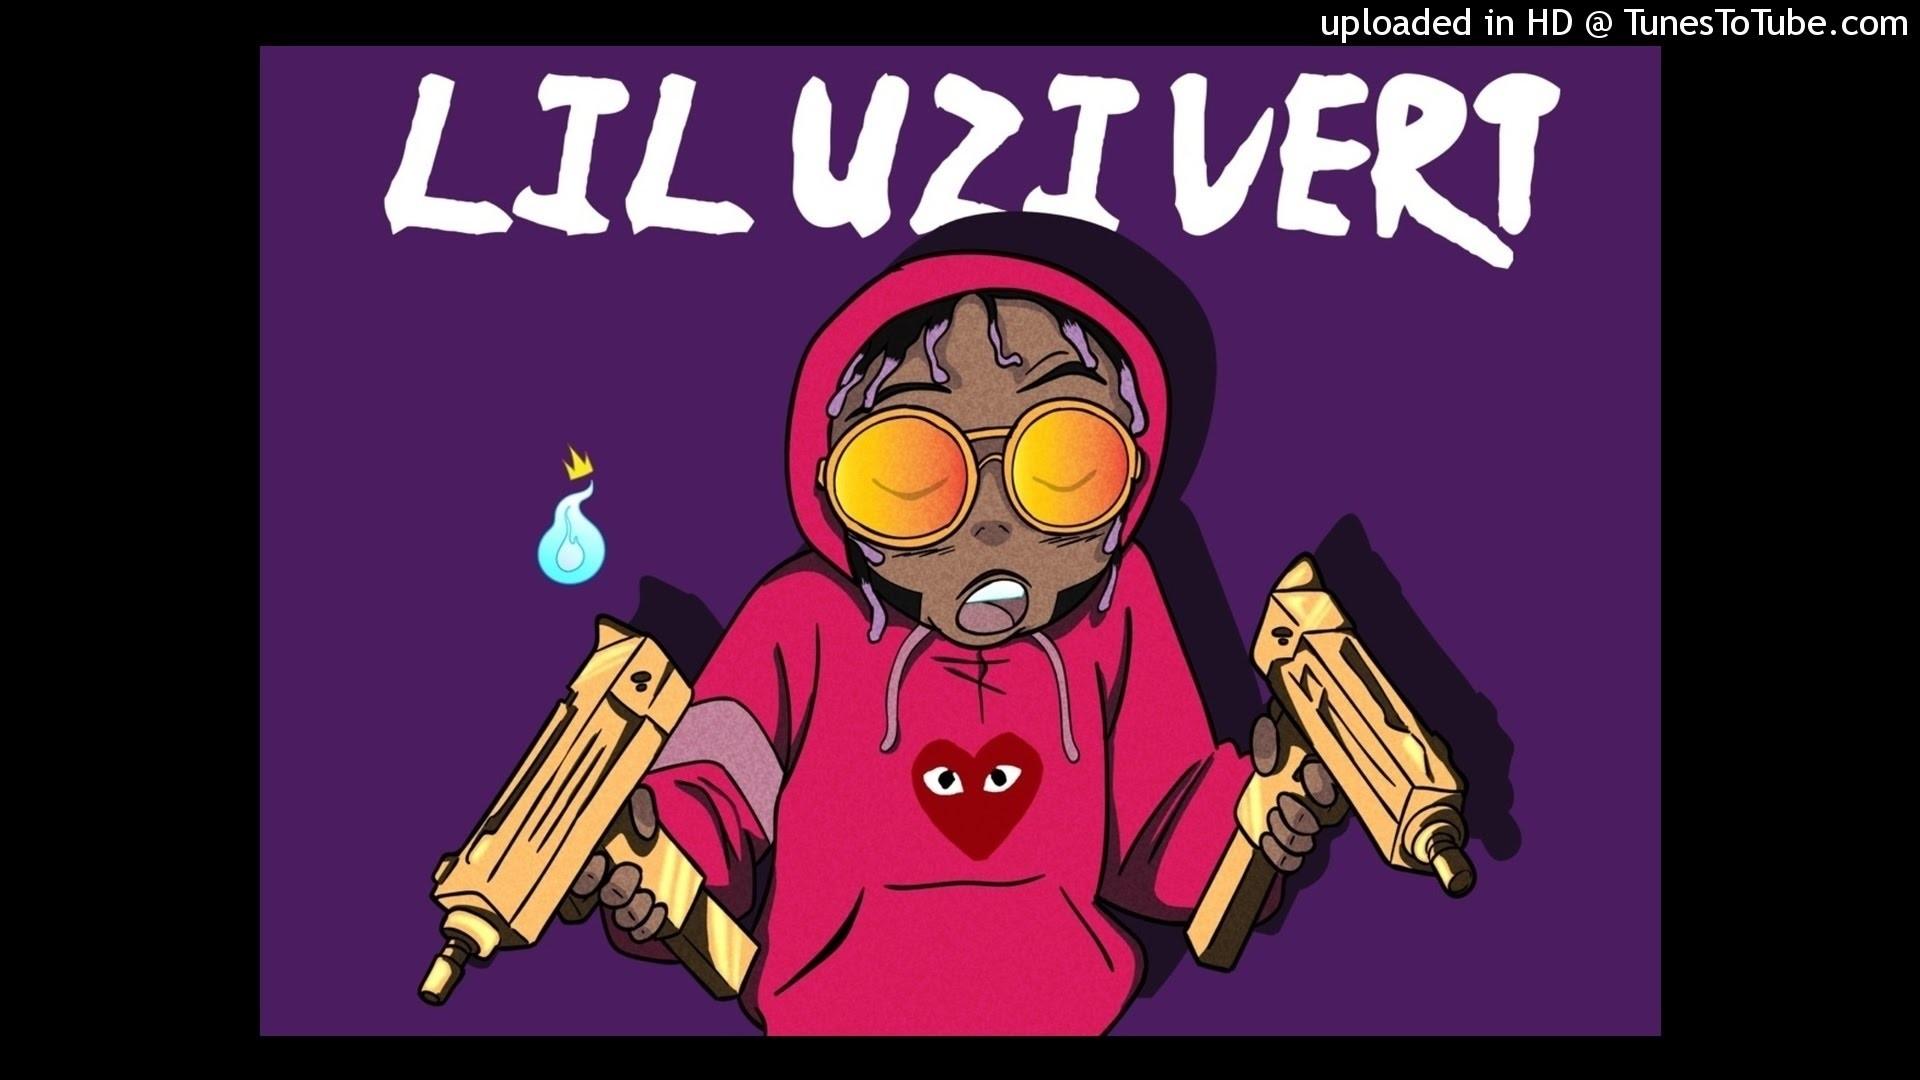 Lil Uzi Wallpapers 74 images 1920x1080